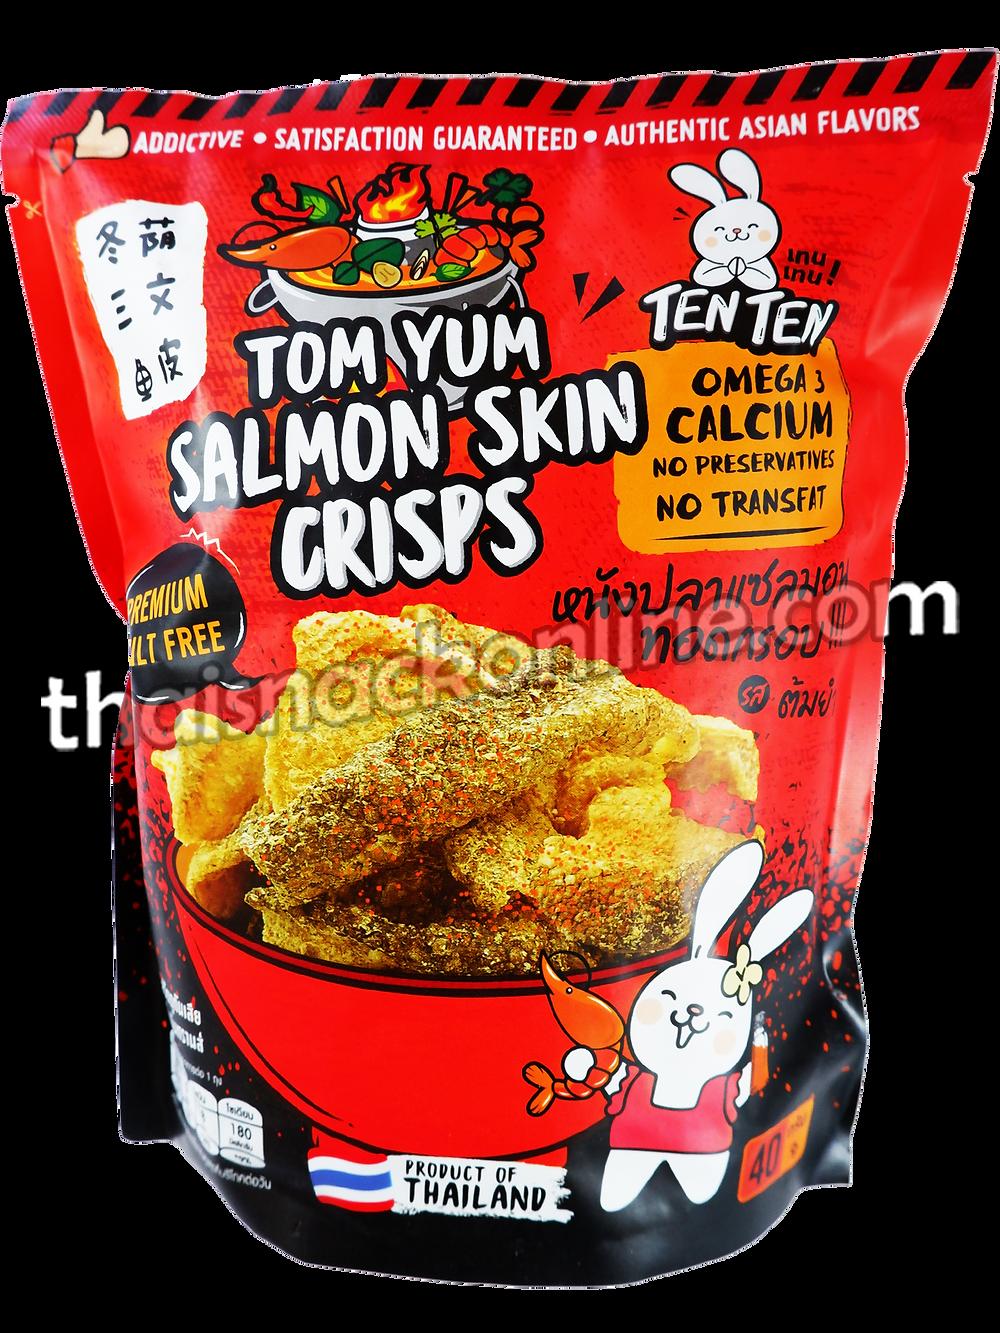 TENTEN - Salmon Skin Crisps Tom Yum